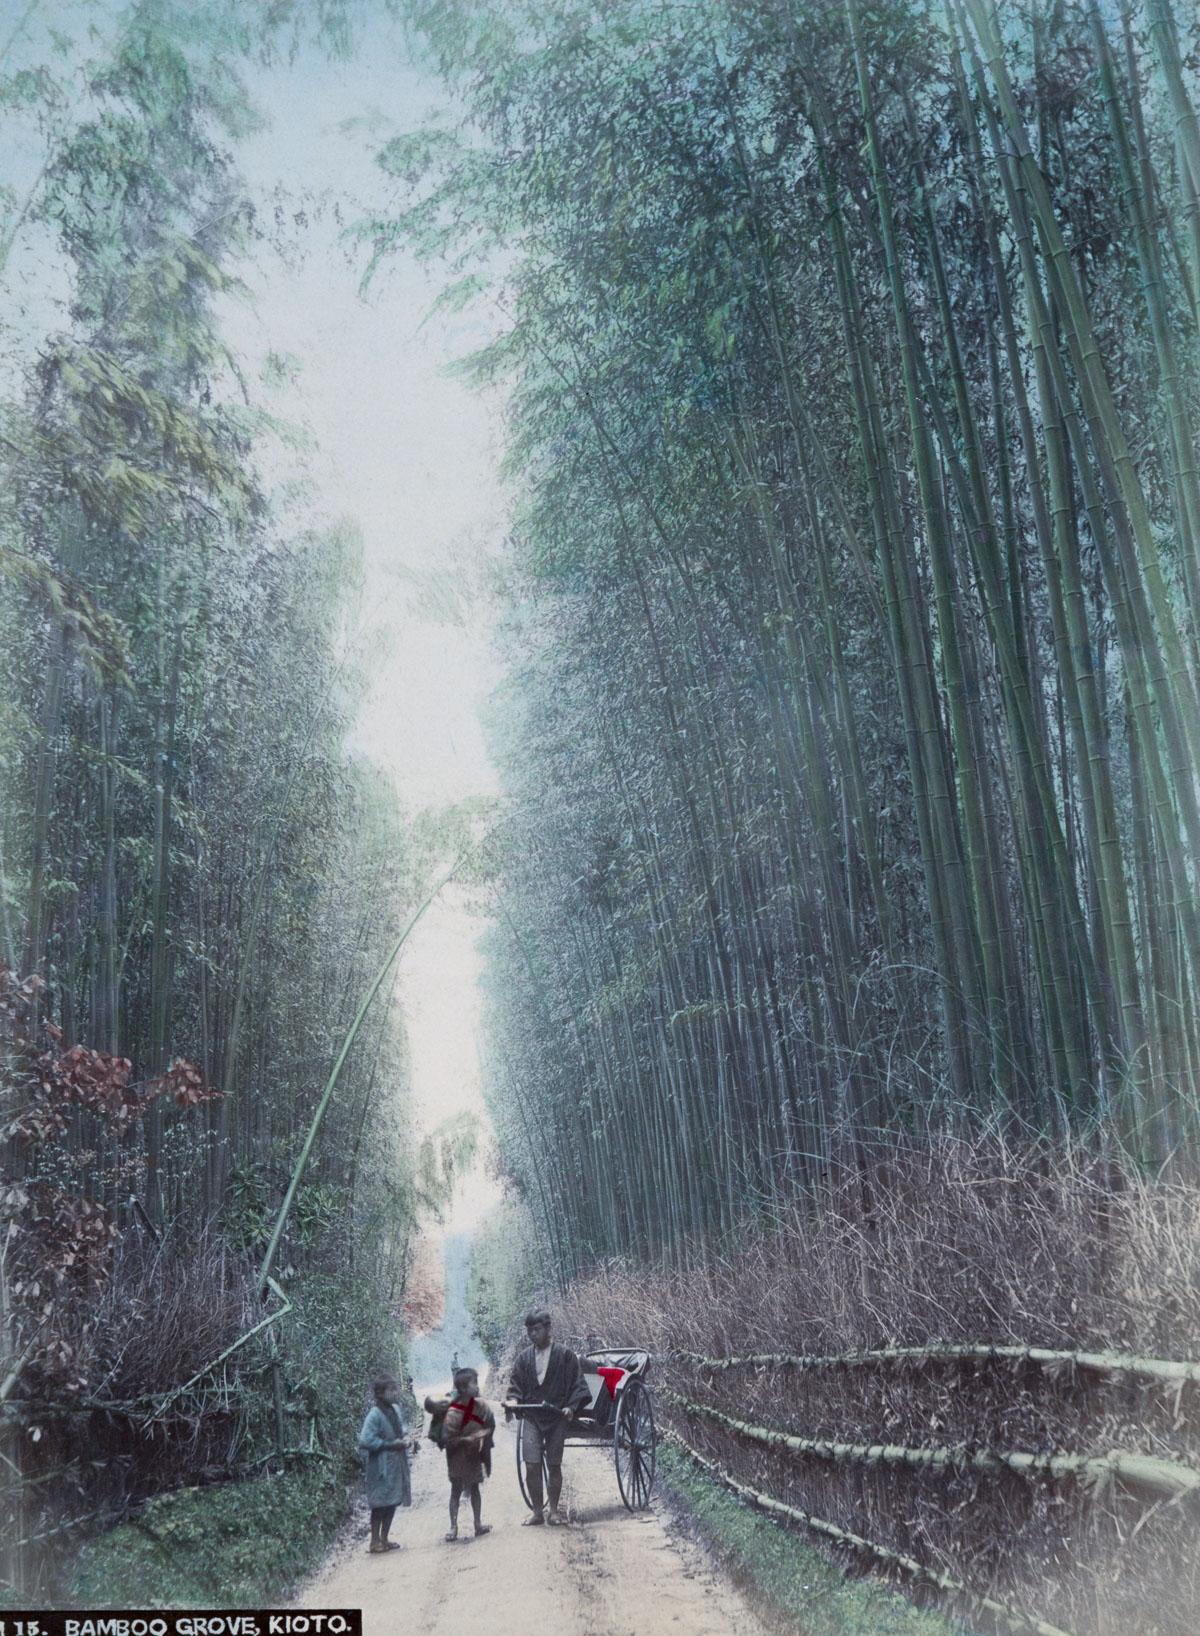 Bamboo Grove, Kioto - Image by New York Public Library